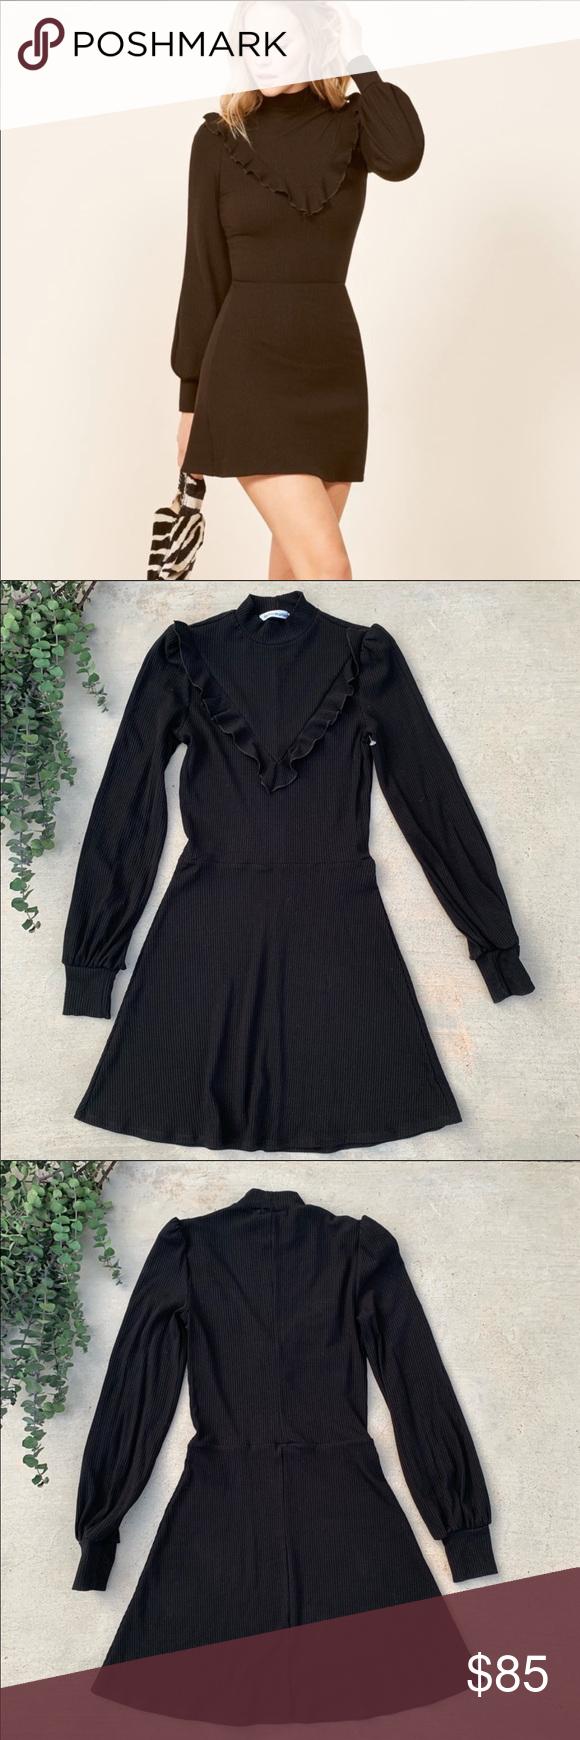 Reformation Chapel Dress  Dresses Fashion Reformation Dress